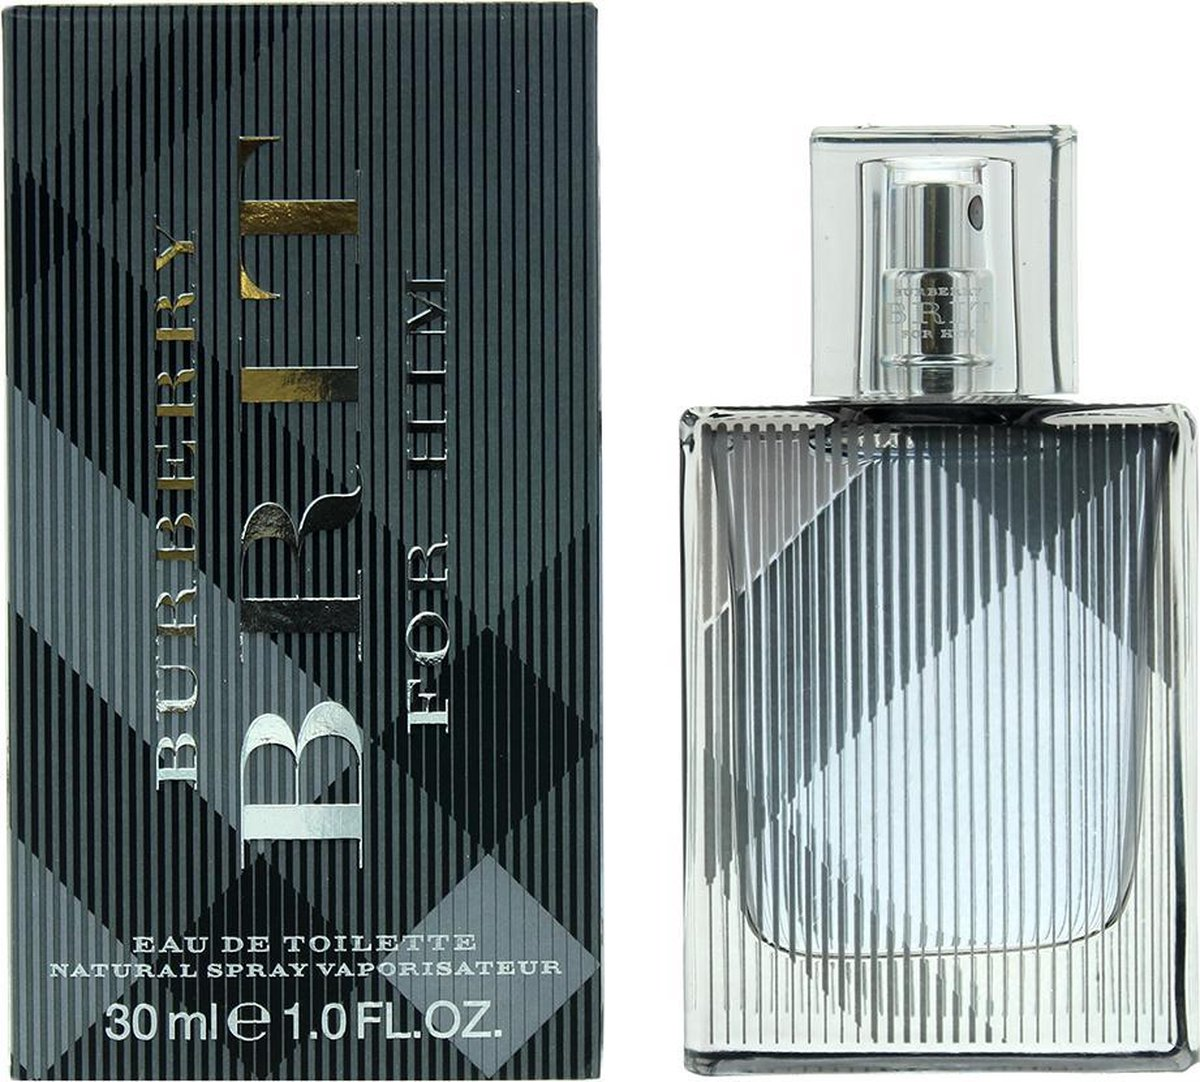 Burberry - Burberry Brit for Men parfum